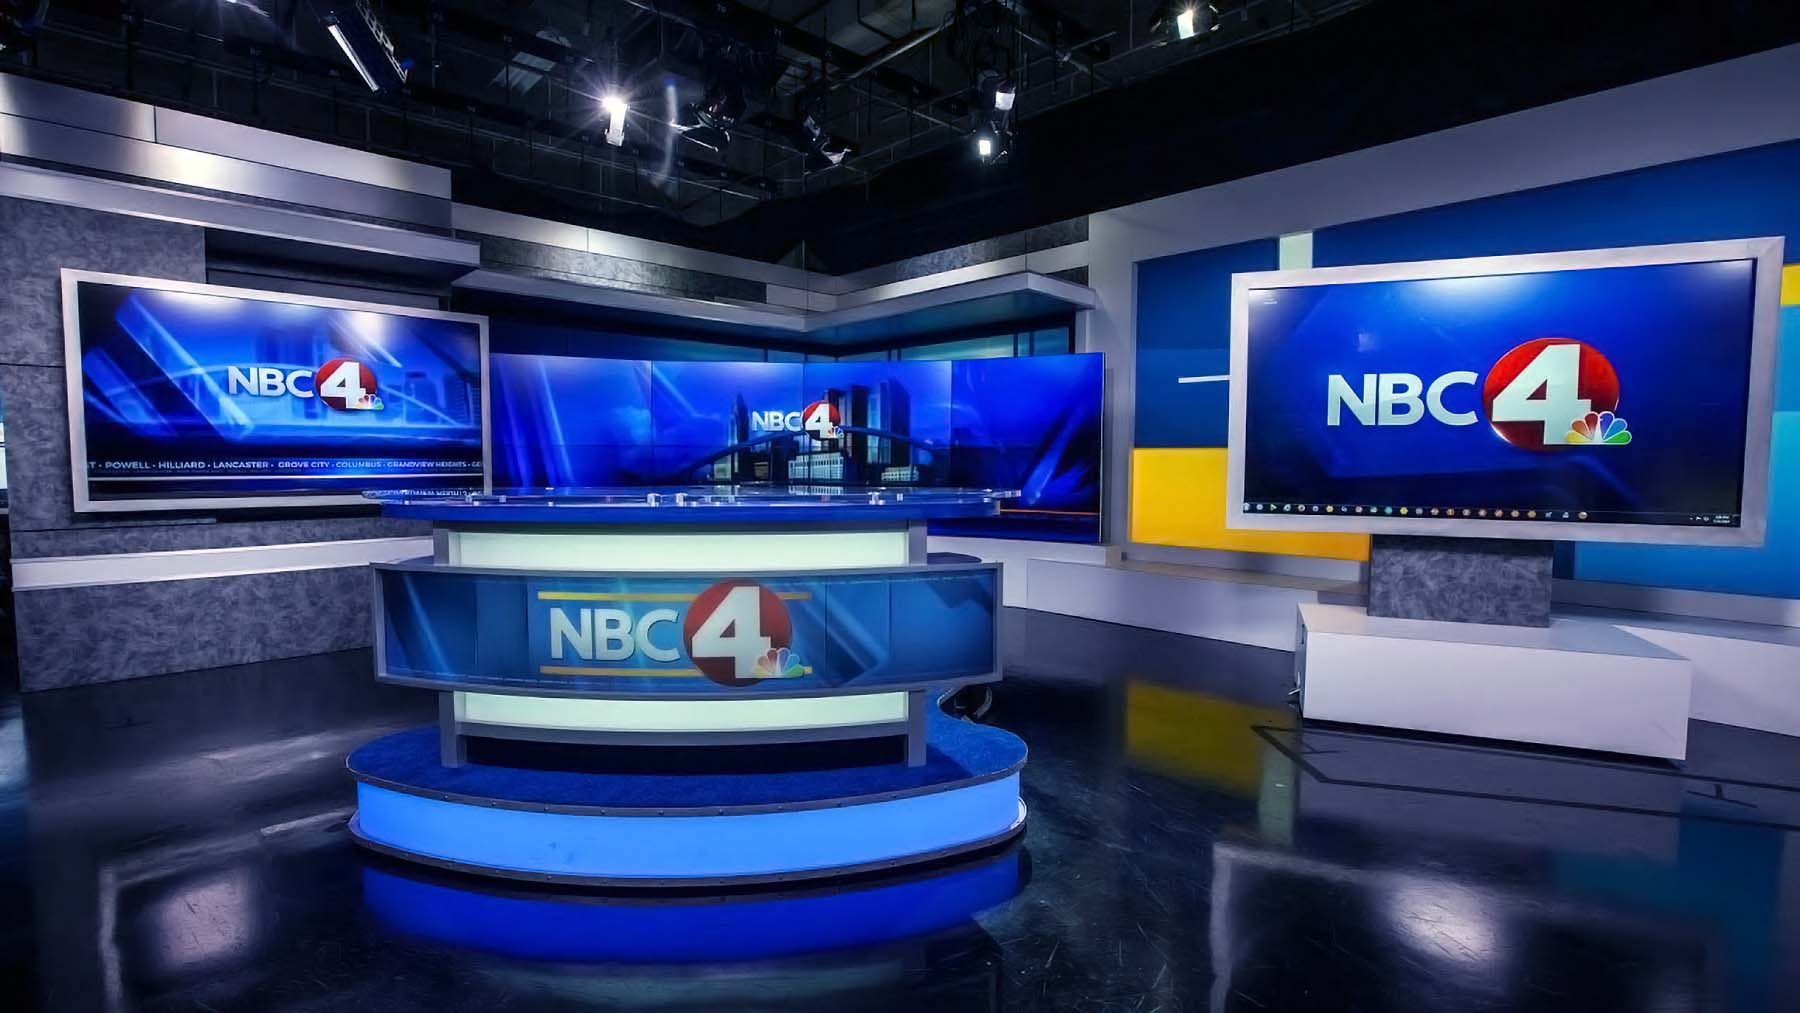 NBC 4 studio